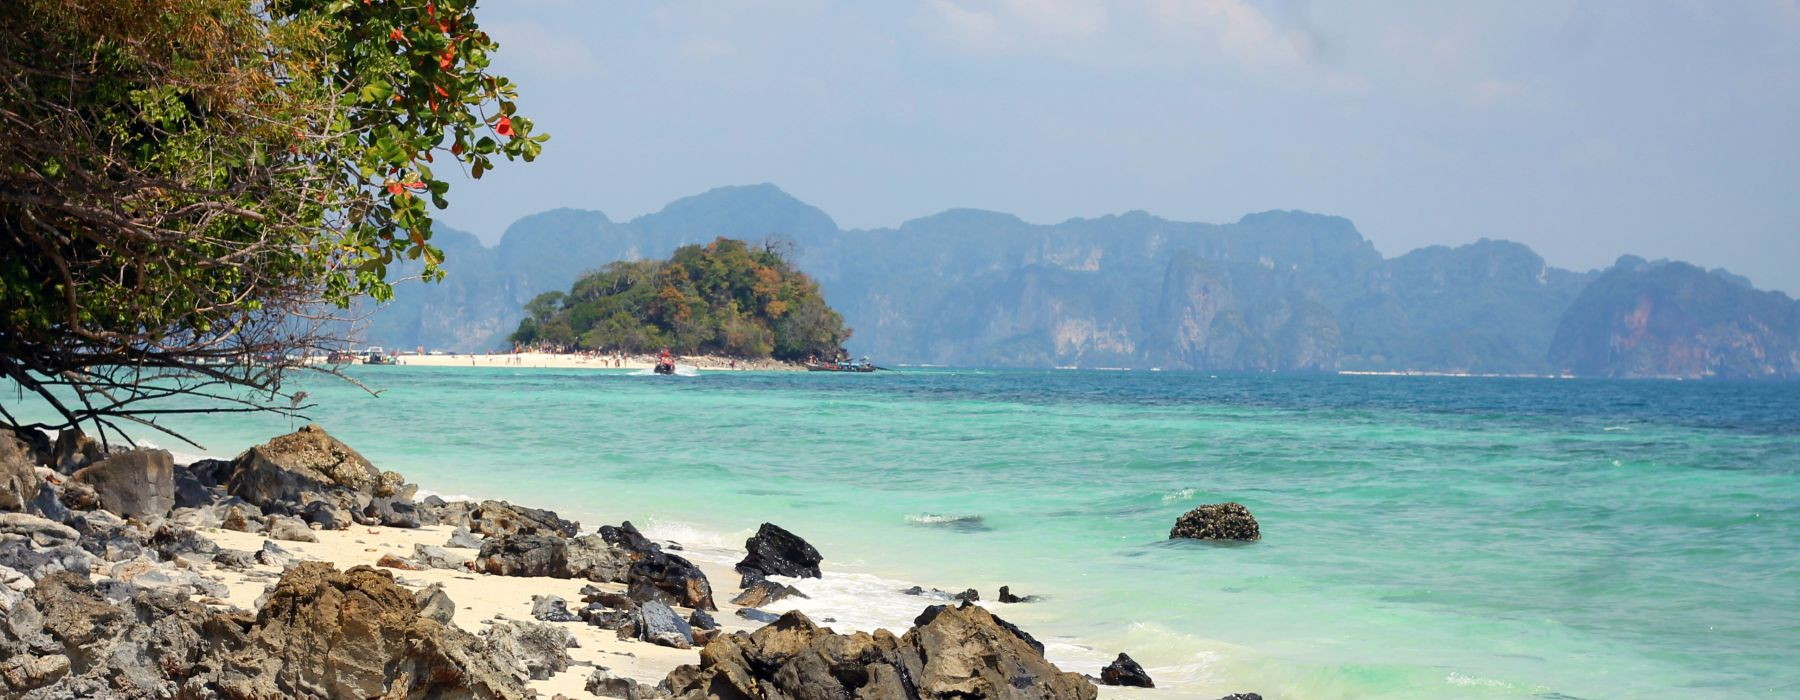 pachet turistic Thailand island hopping cover